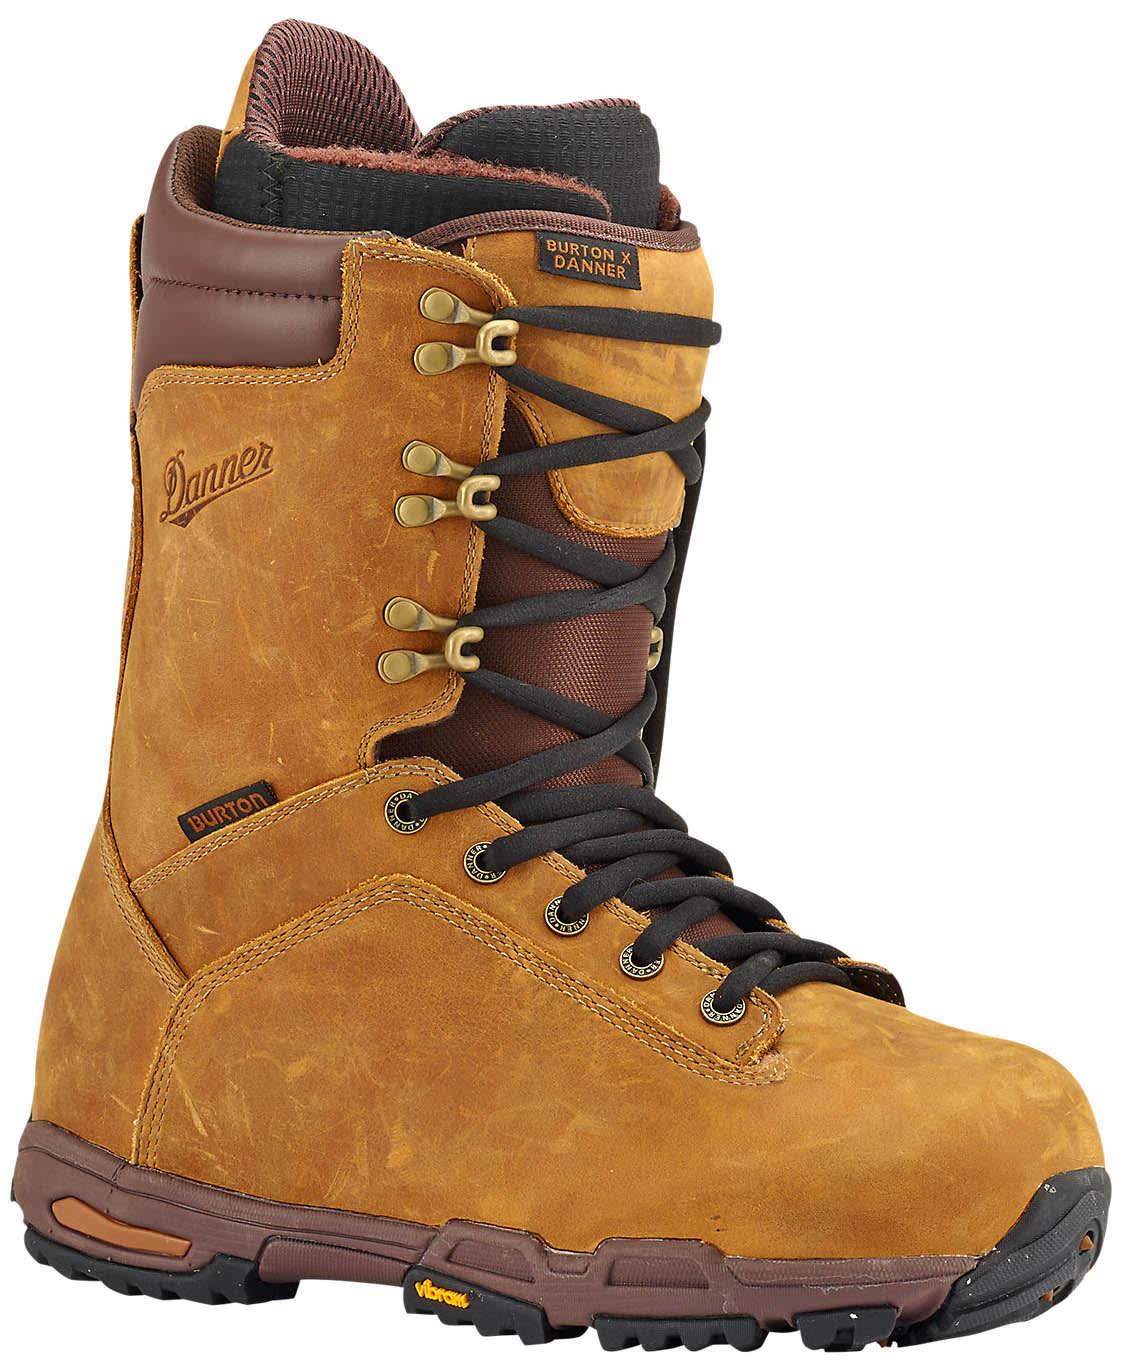 Burton Burton X Danner Snowboard Boots 2017